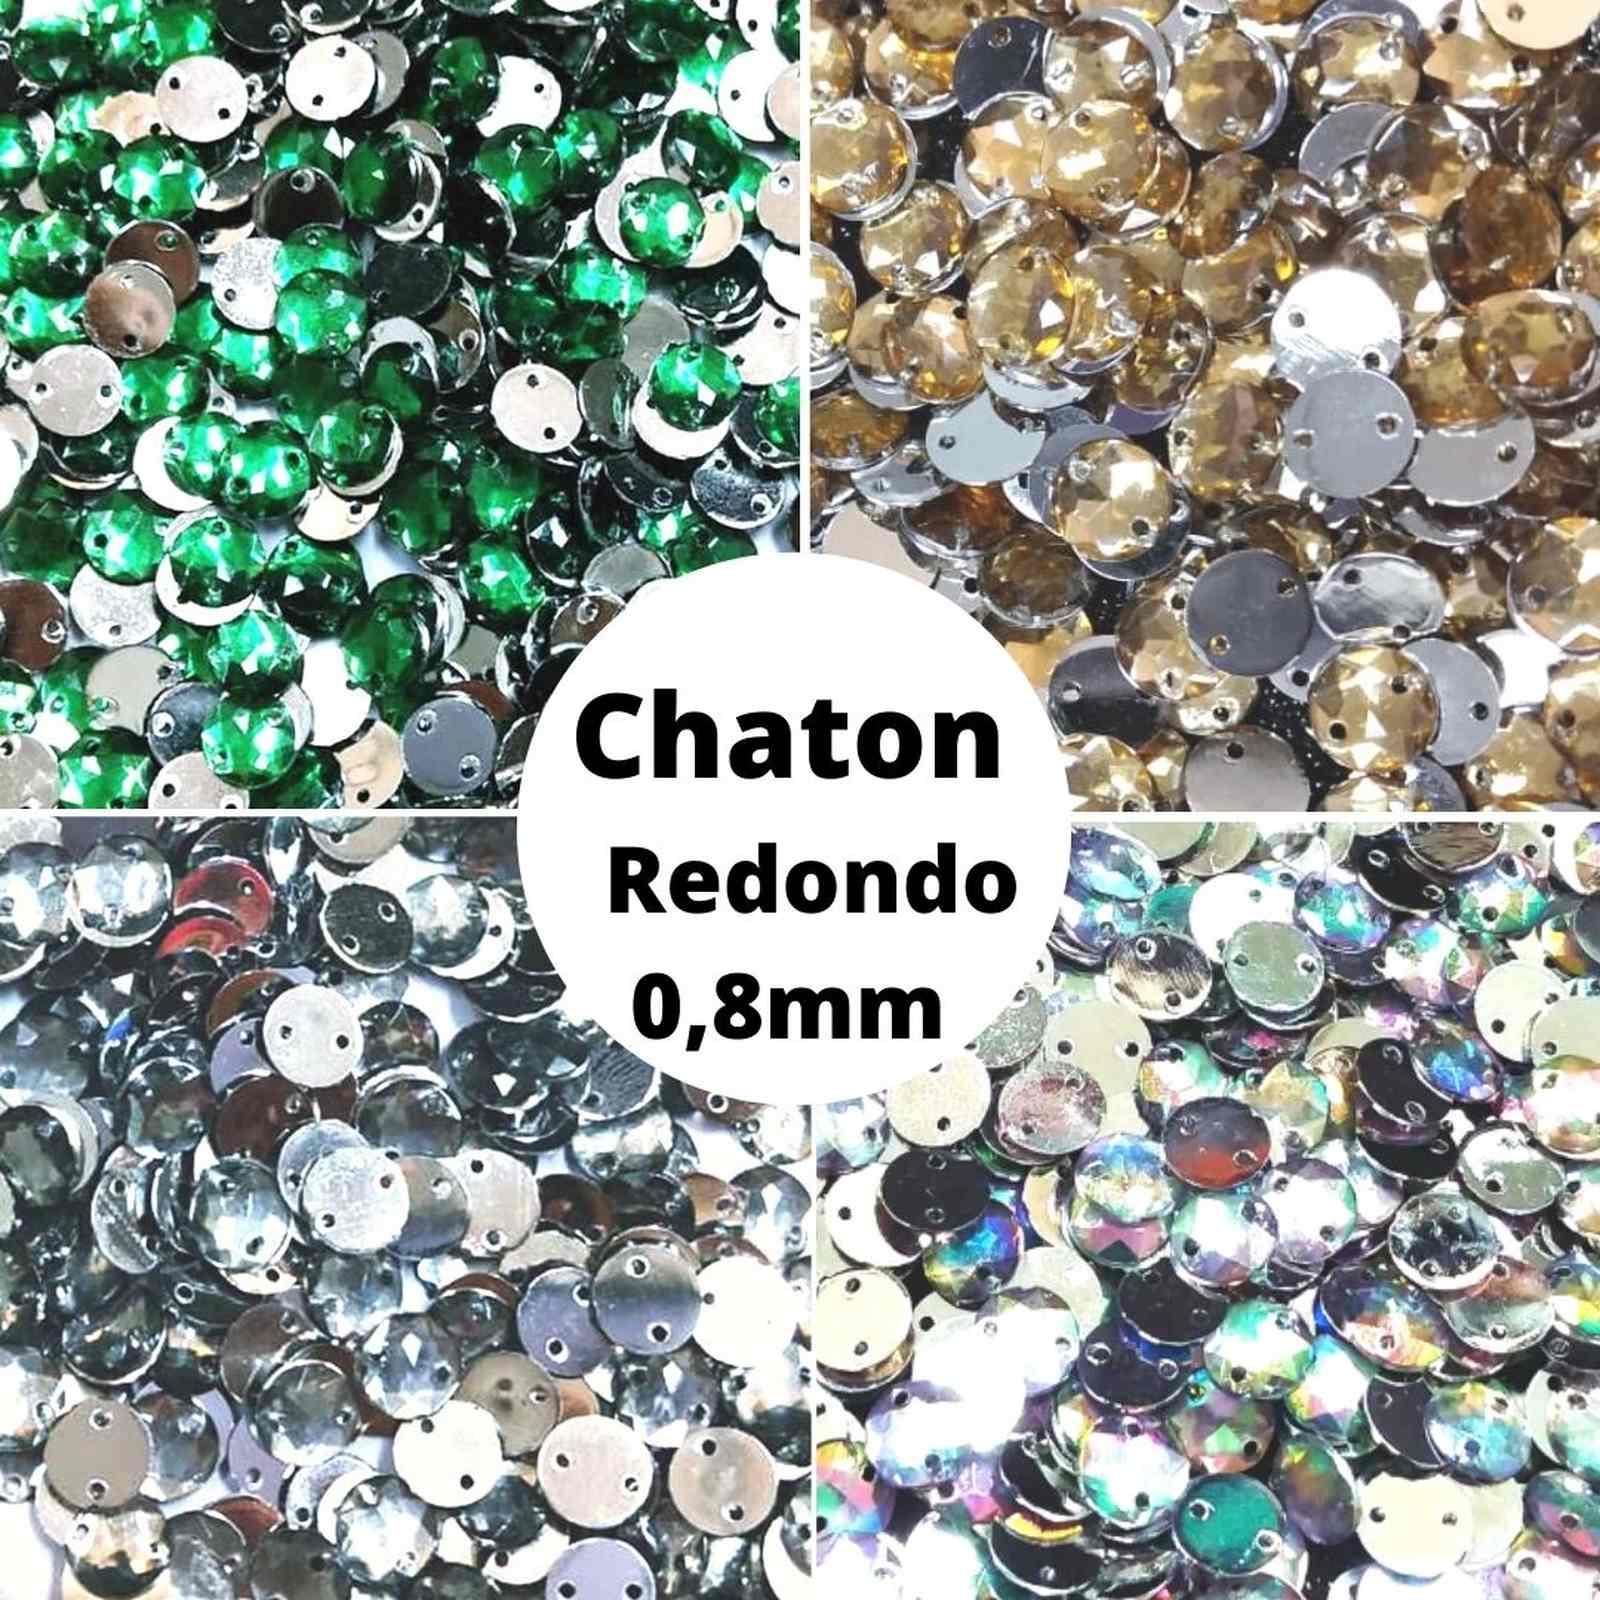 Chaton Redondo Acrilico - 08mm - Pacote com 2.000 unidades